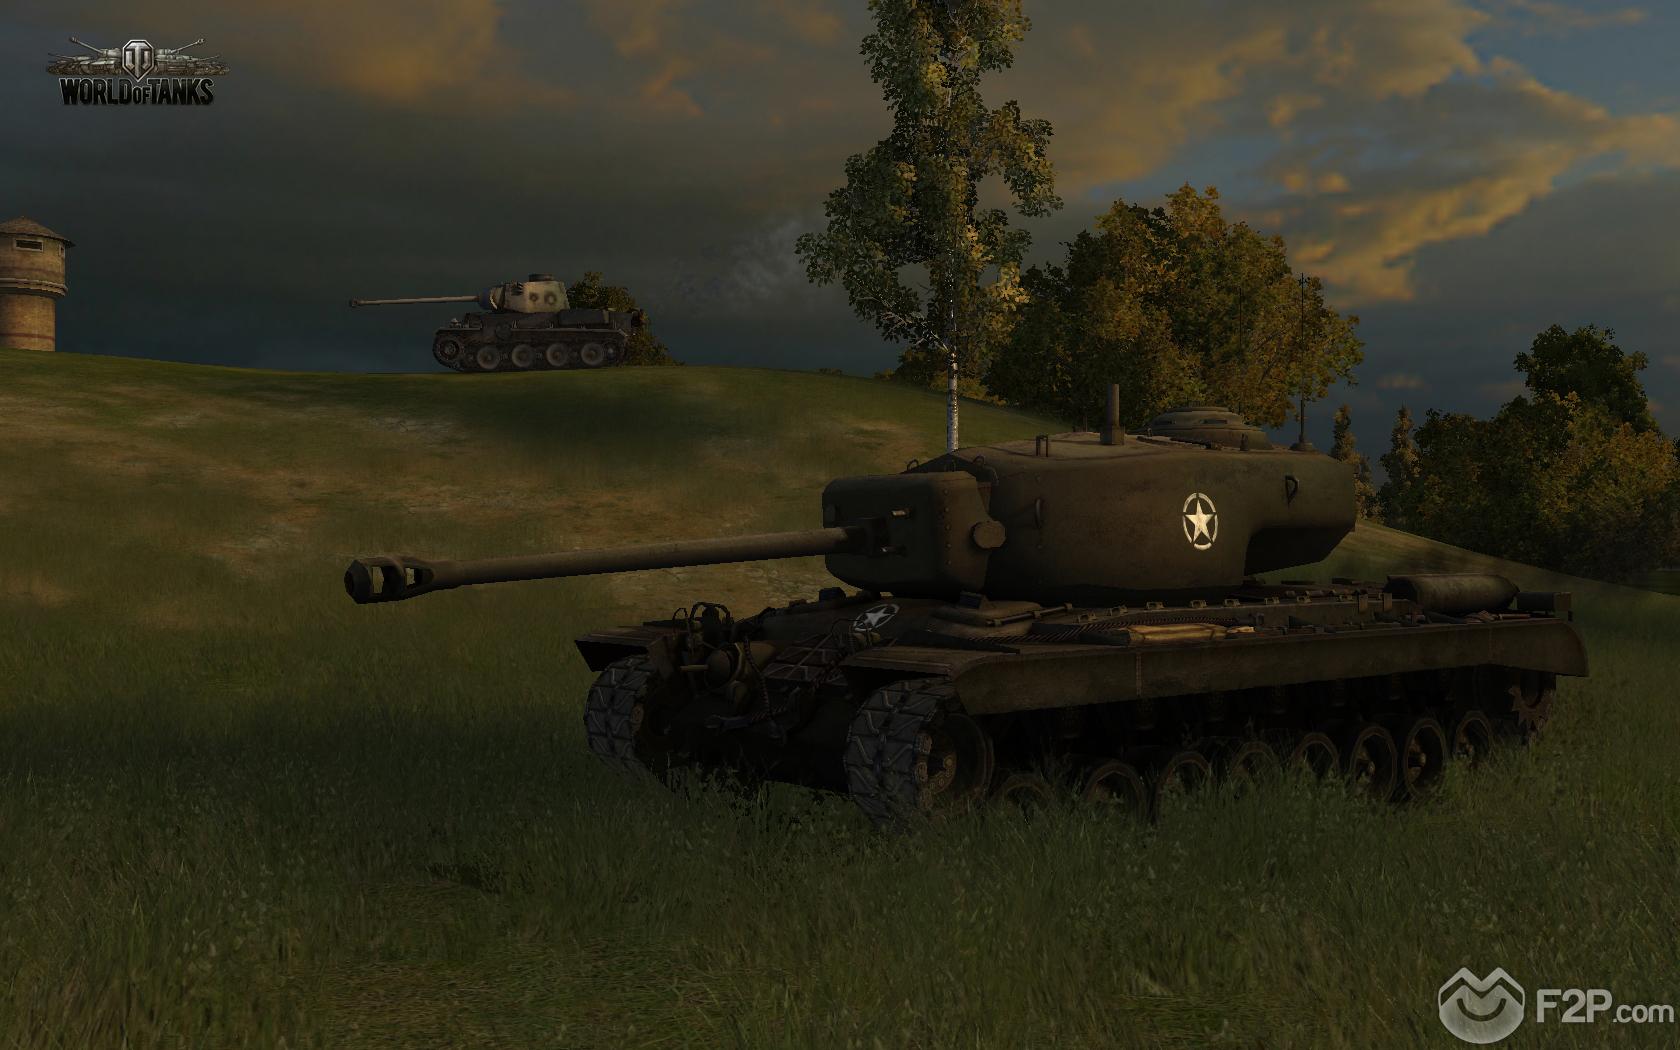 Click image for larger version.Name:World of Tanks 66.jpgViews:121Size:1.09 MBID:3848